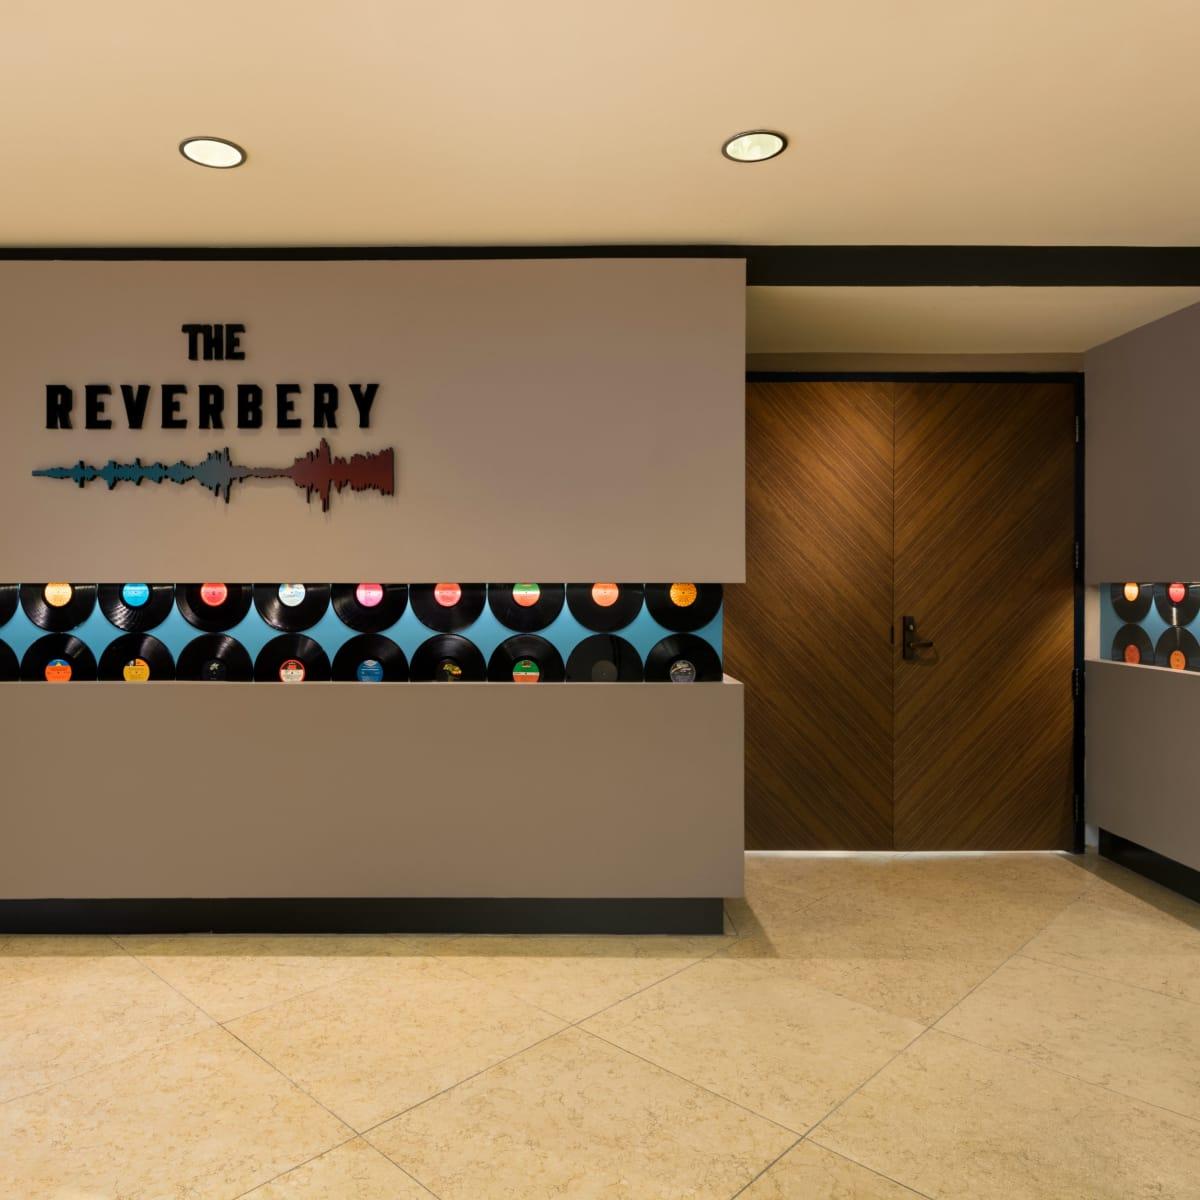 The Reverbery venue entrance